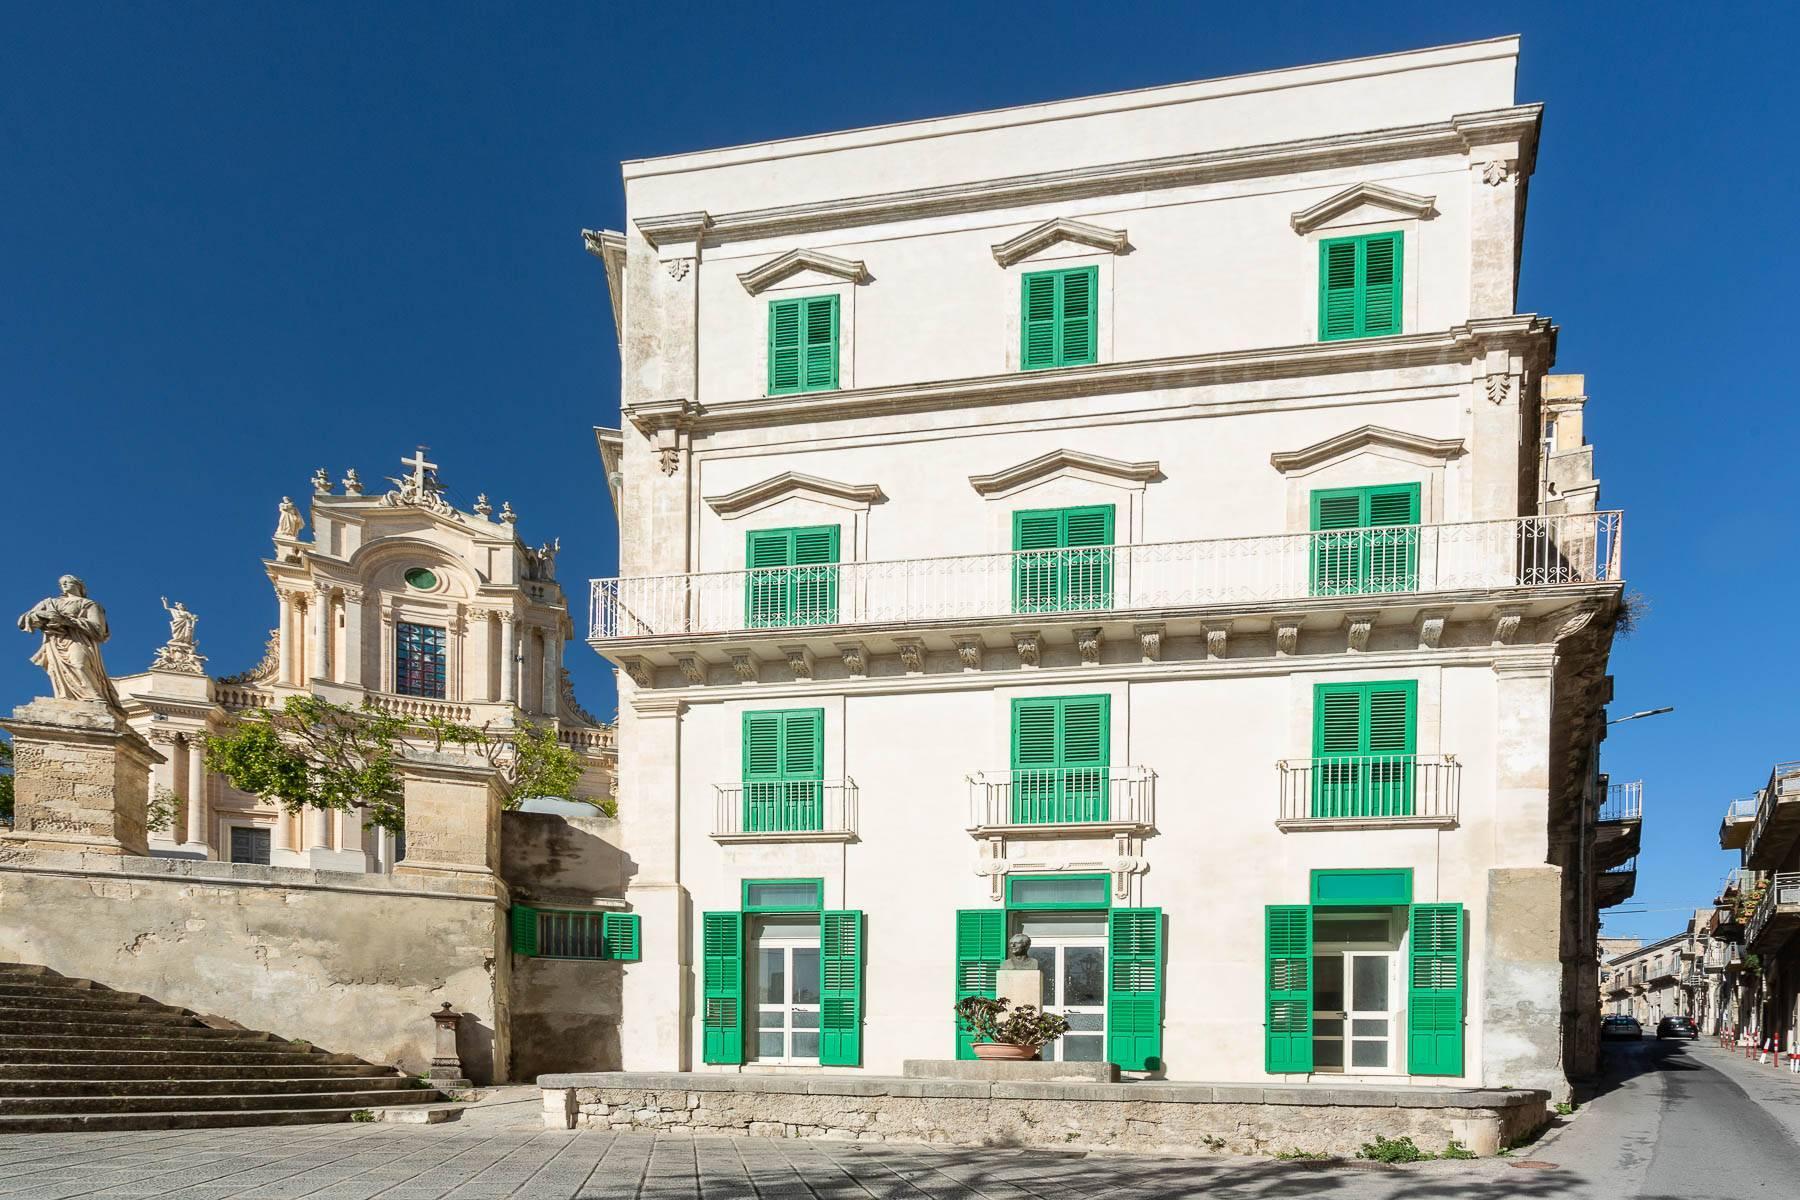 Palazzo storico a Modica - 1